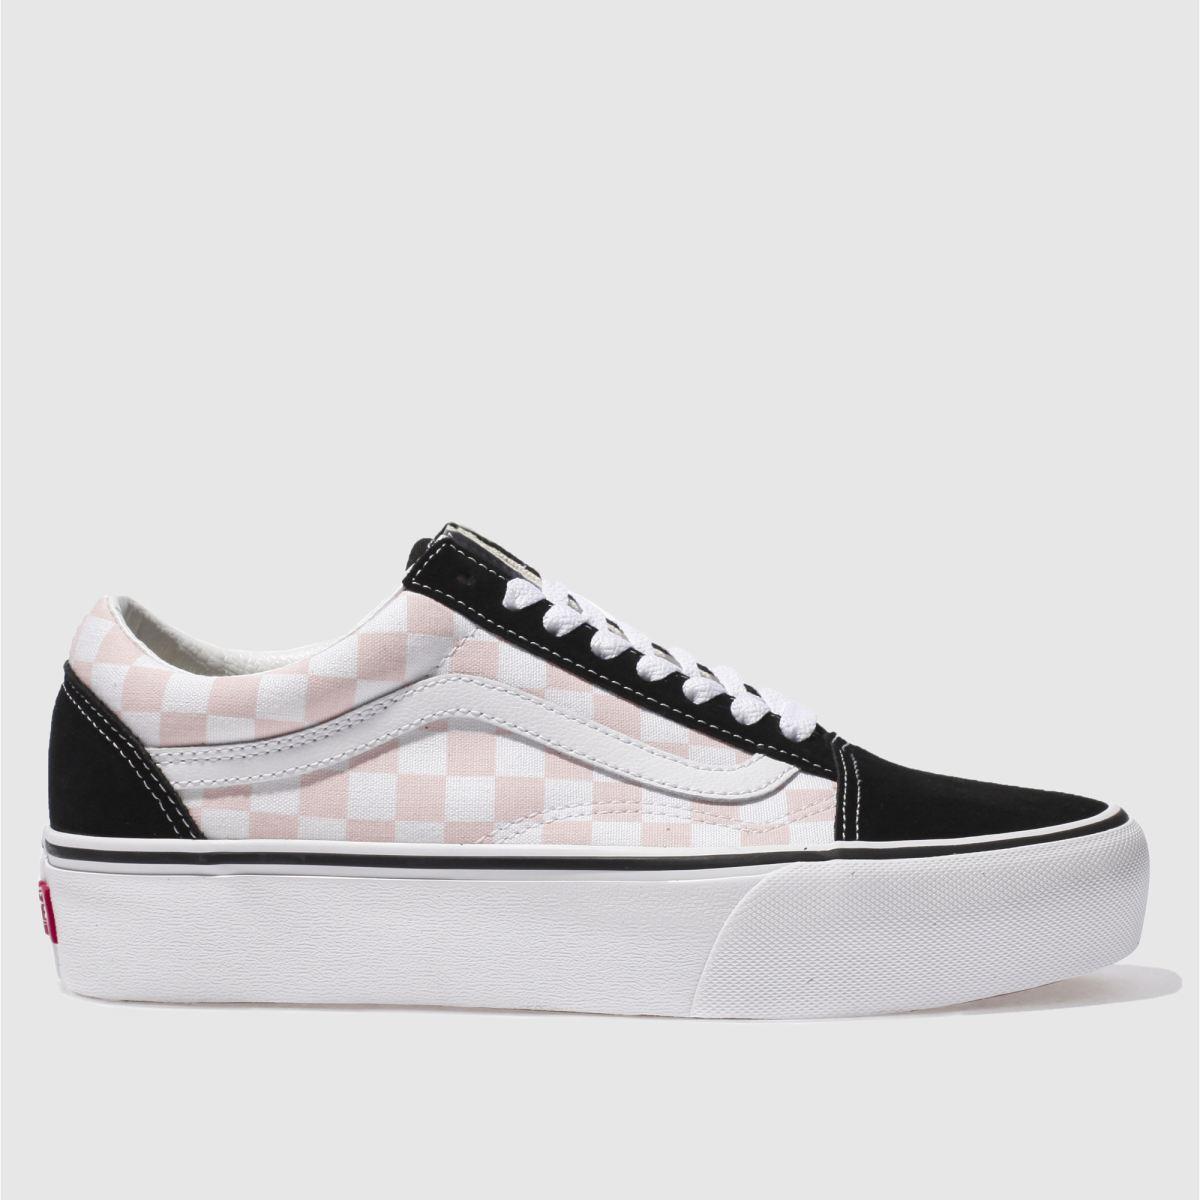 Womens White Amp Pink Vans Old Skool Platform Check Trainers